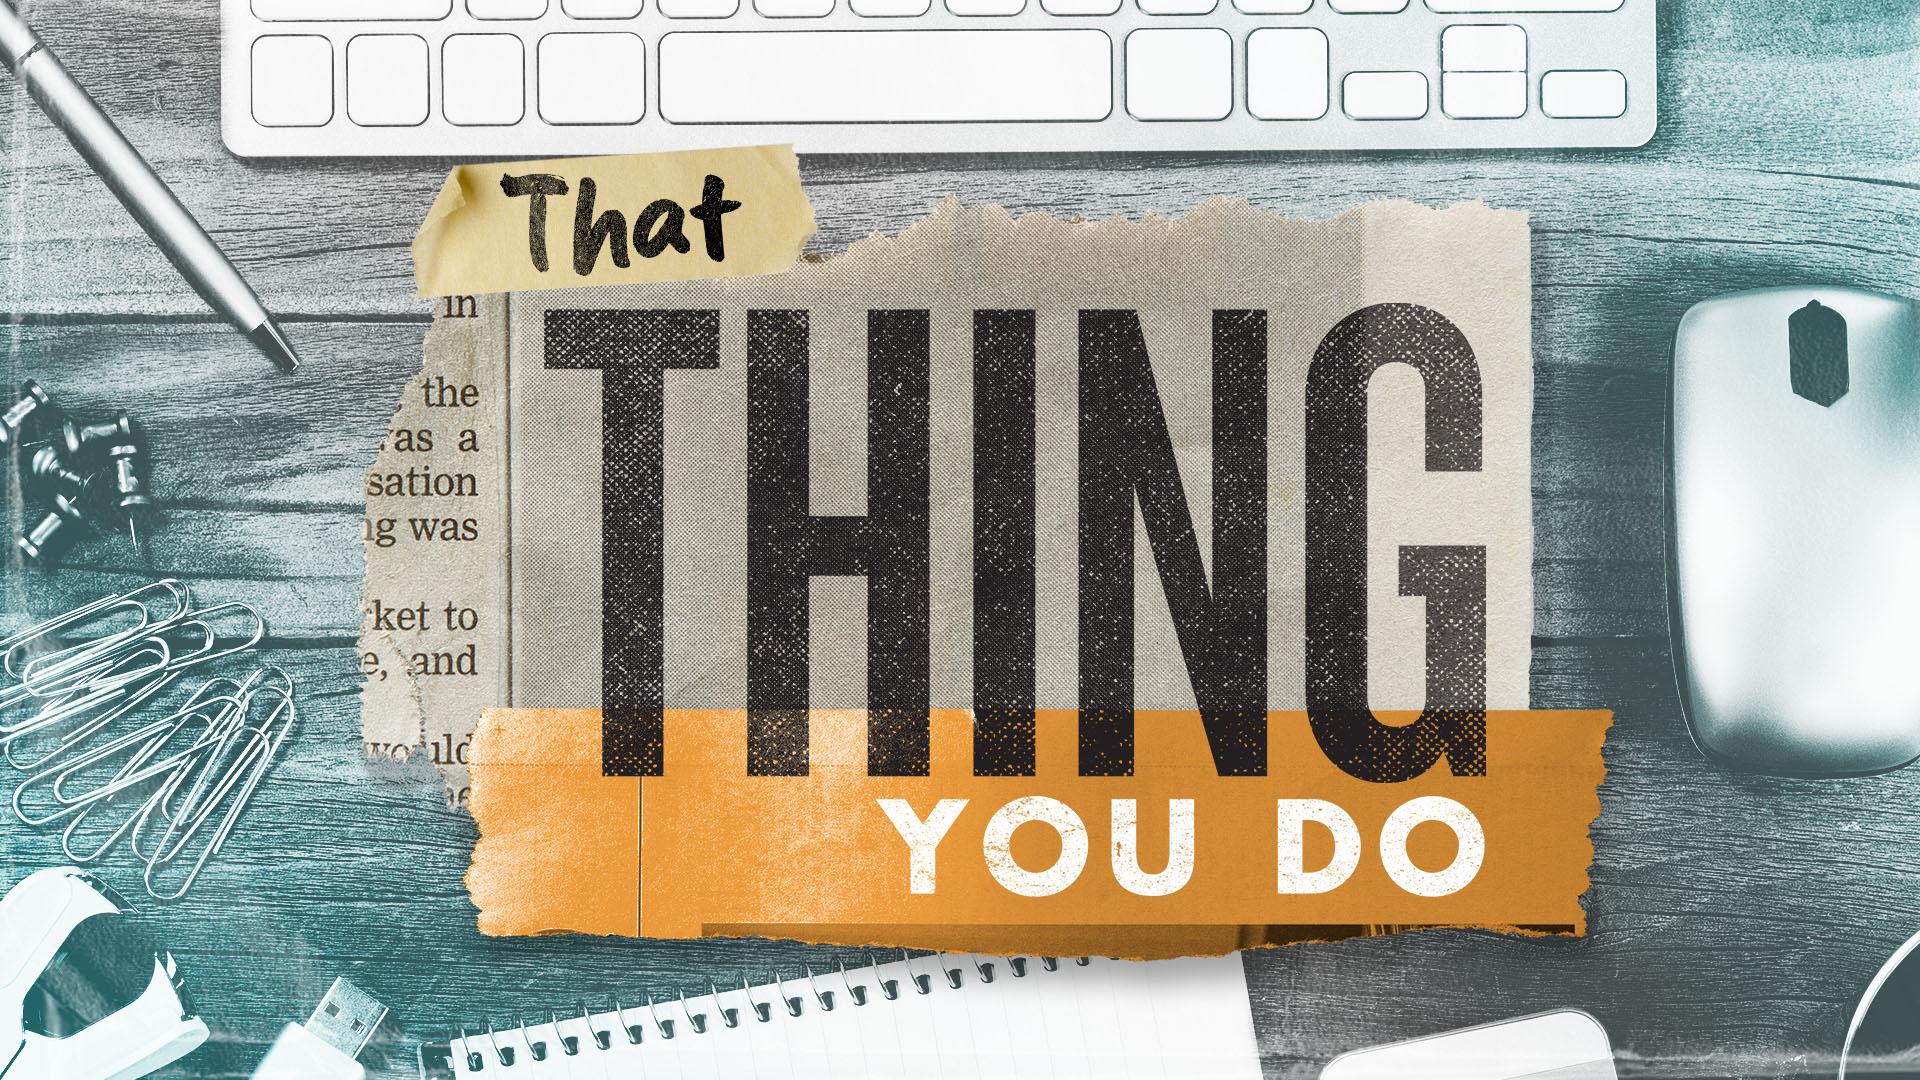 Southeast Christian Church: That Thing You Do | Shane Harris